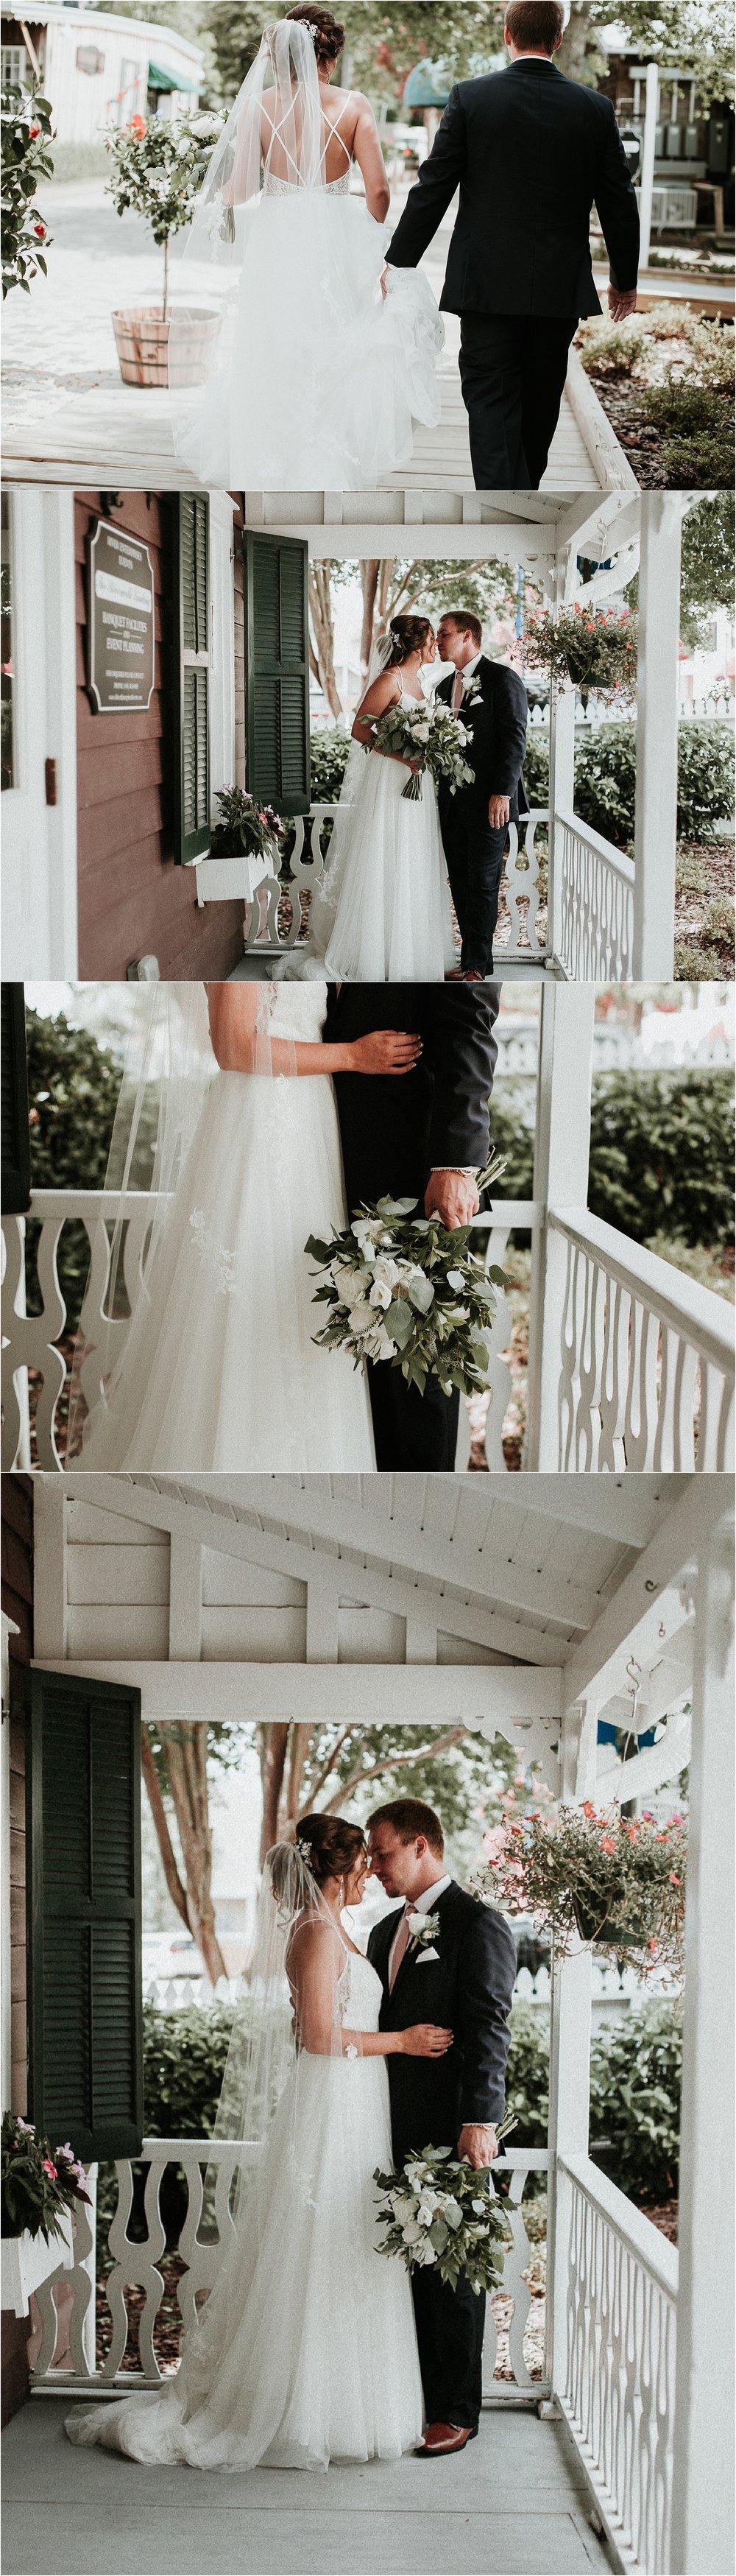 Riverwalk-Landing-wedding-wilmington-NC_0024.jpg